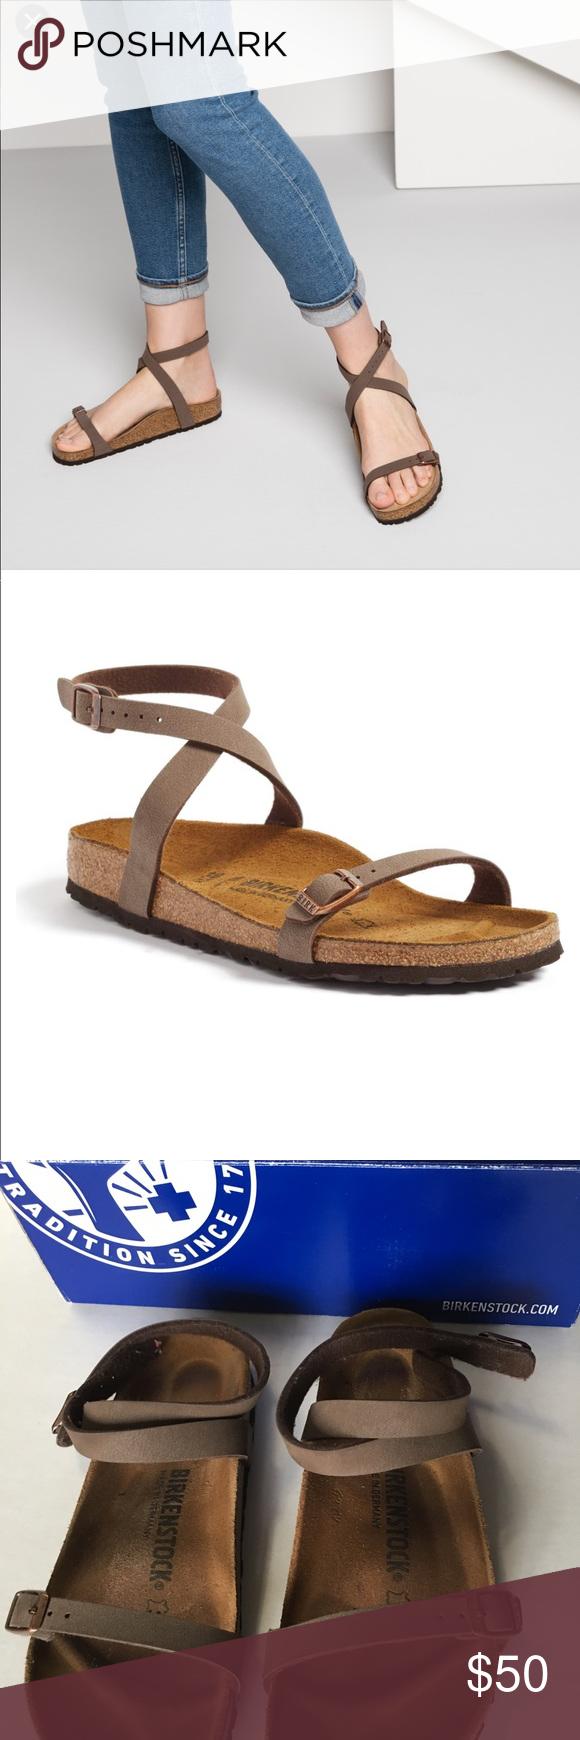 188fba91977 Daloa Mocca Birkenstock. Daloa Mocca Birkenstock A wraparound strap adds to  the feminine appeal of a classic Birkenstock sandal ...